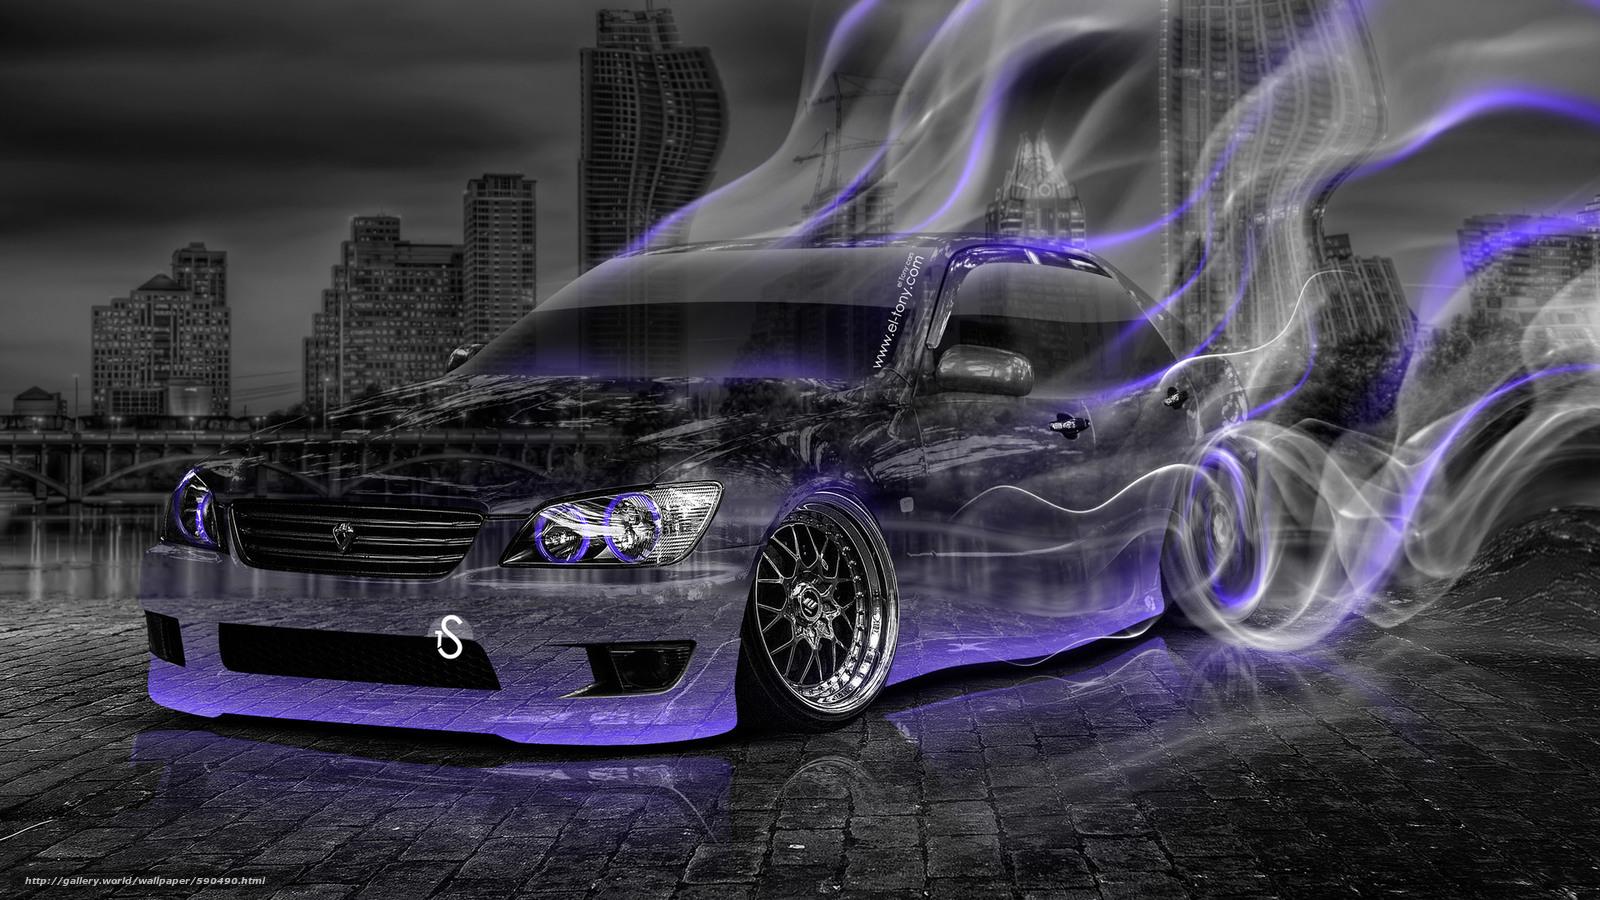 Elegant Tony Kokhan, Toyota, Altezza, JDM, Crystal, Car, Smoke, Drift, Style,  Violet, Neon, Night, El Tony Cars, Photoshop, HD Wallpapers, Tony Cohan,  Photoshop, ...